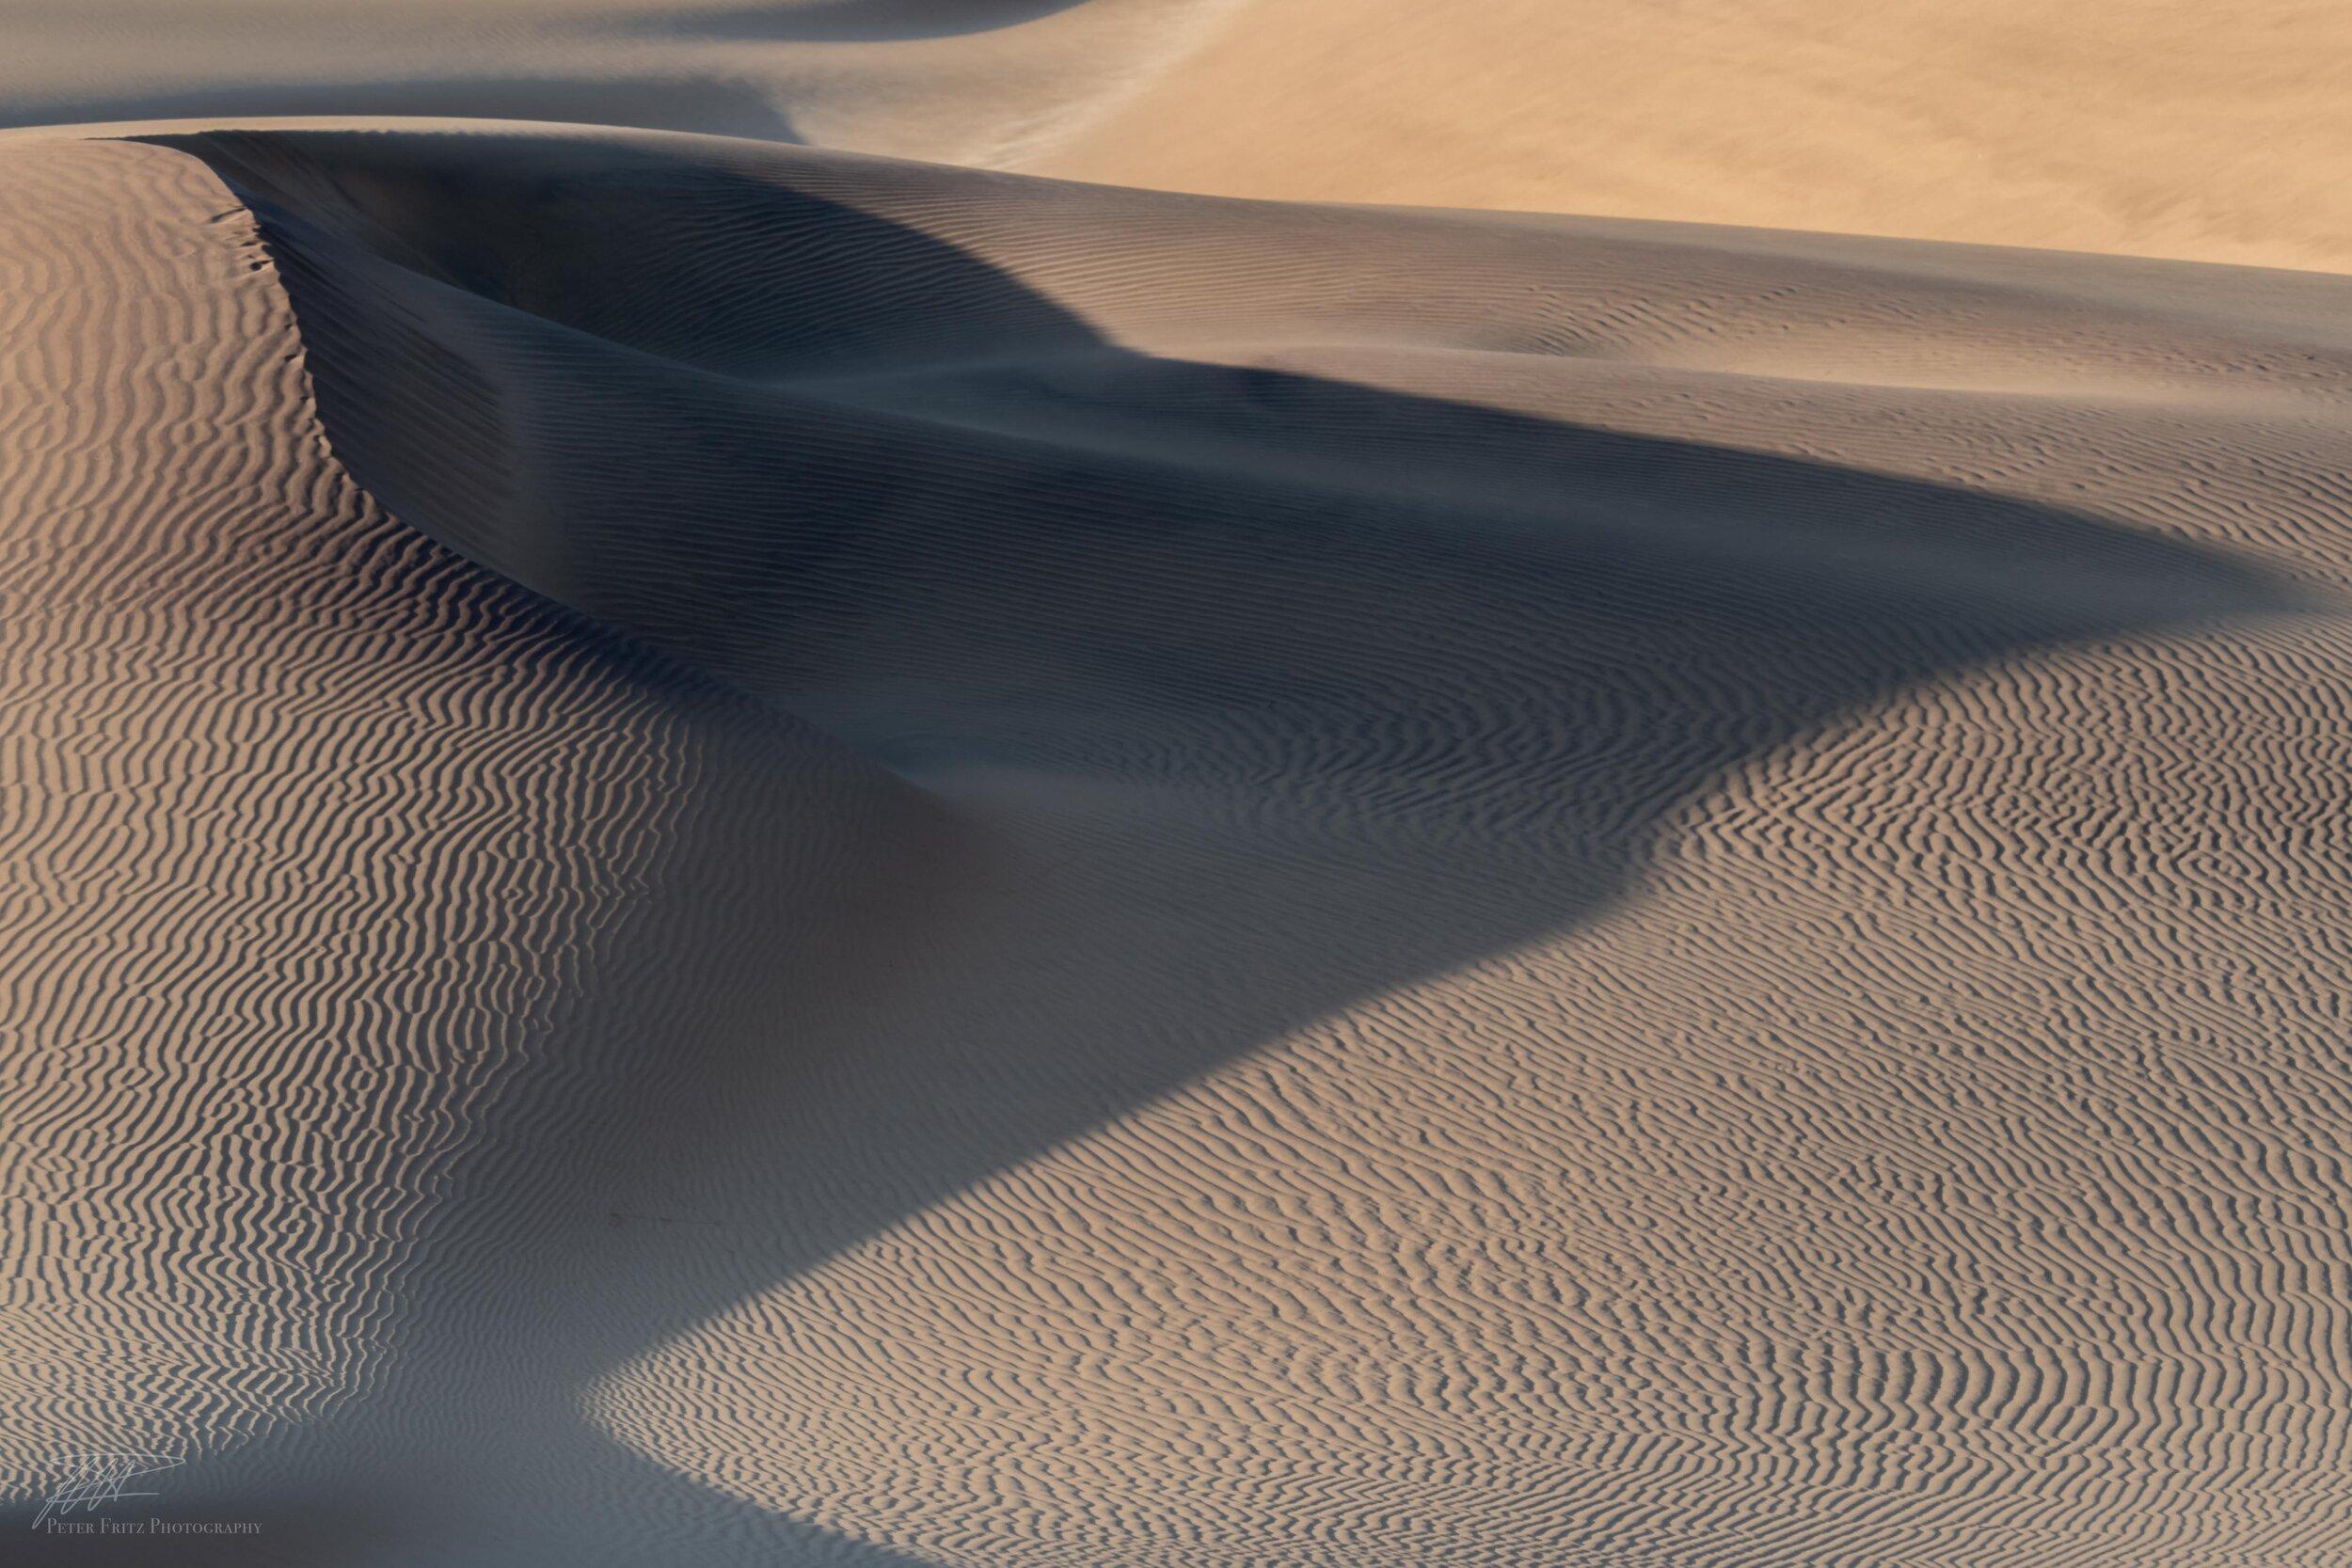 Triangels in the sand 3x2 web_.jpg